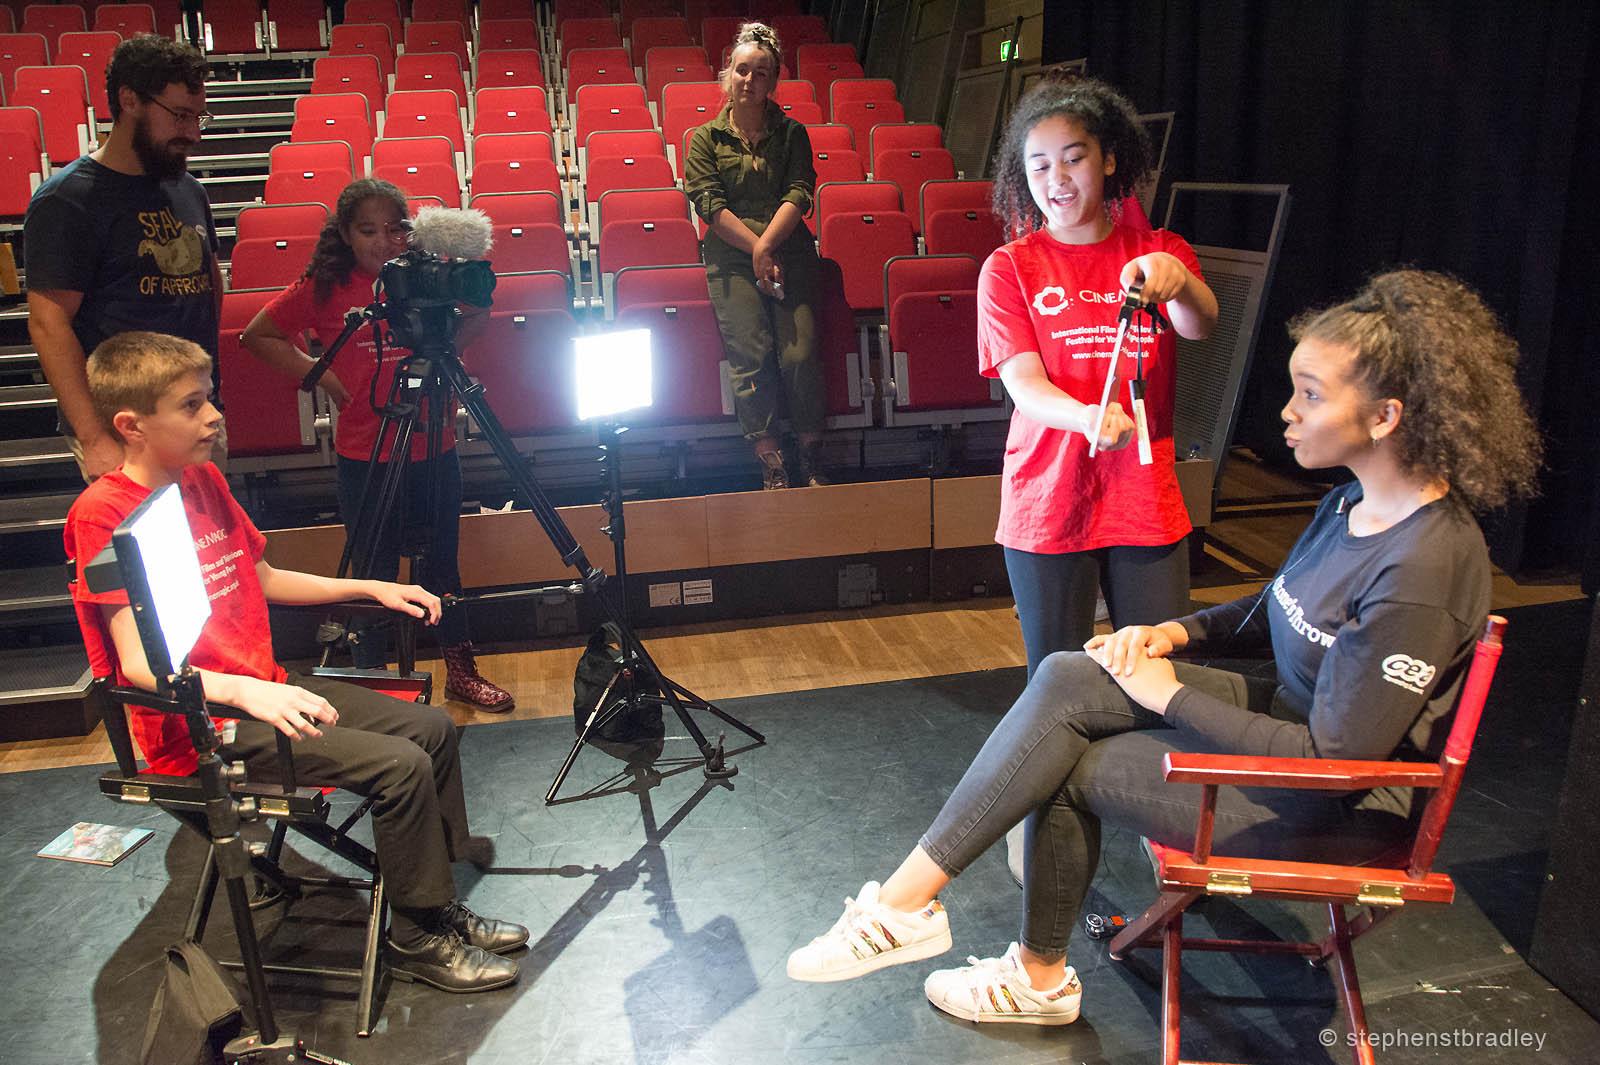 PR Photography of children learning video production skills, photo 8457 - PR photographer Dublin, Ireland